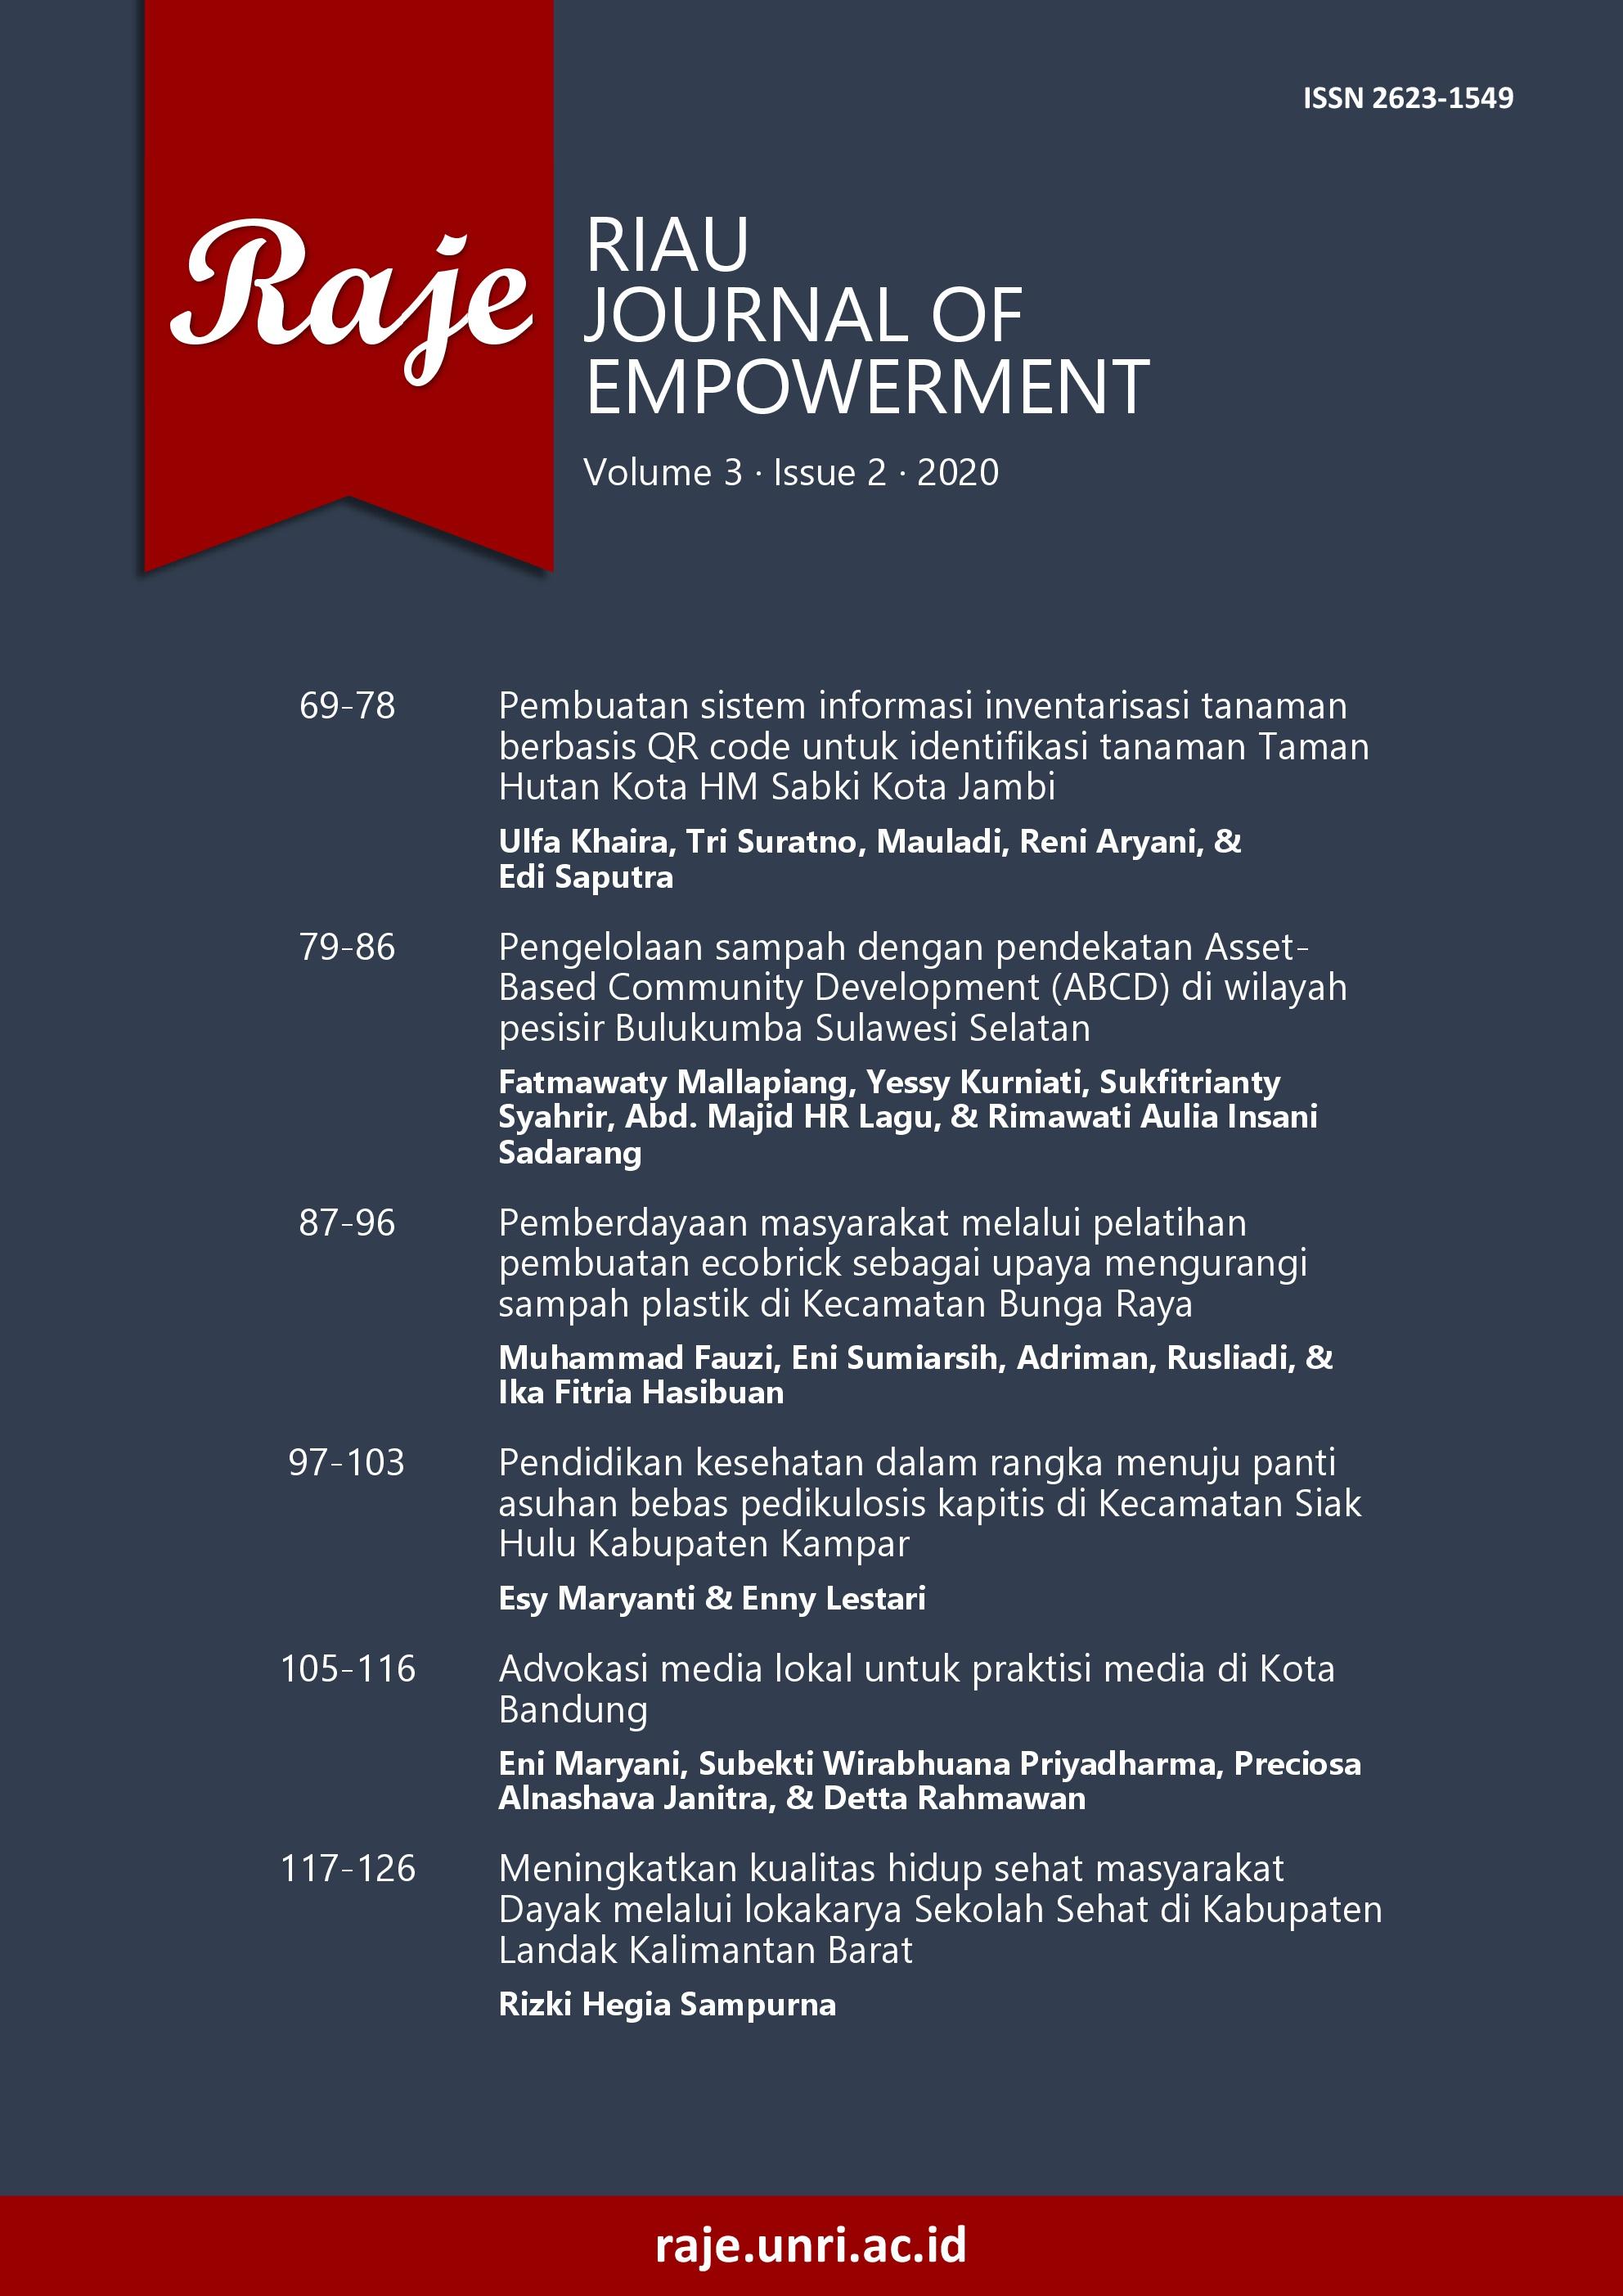 Riau Journal of Empowerment, 3(2)